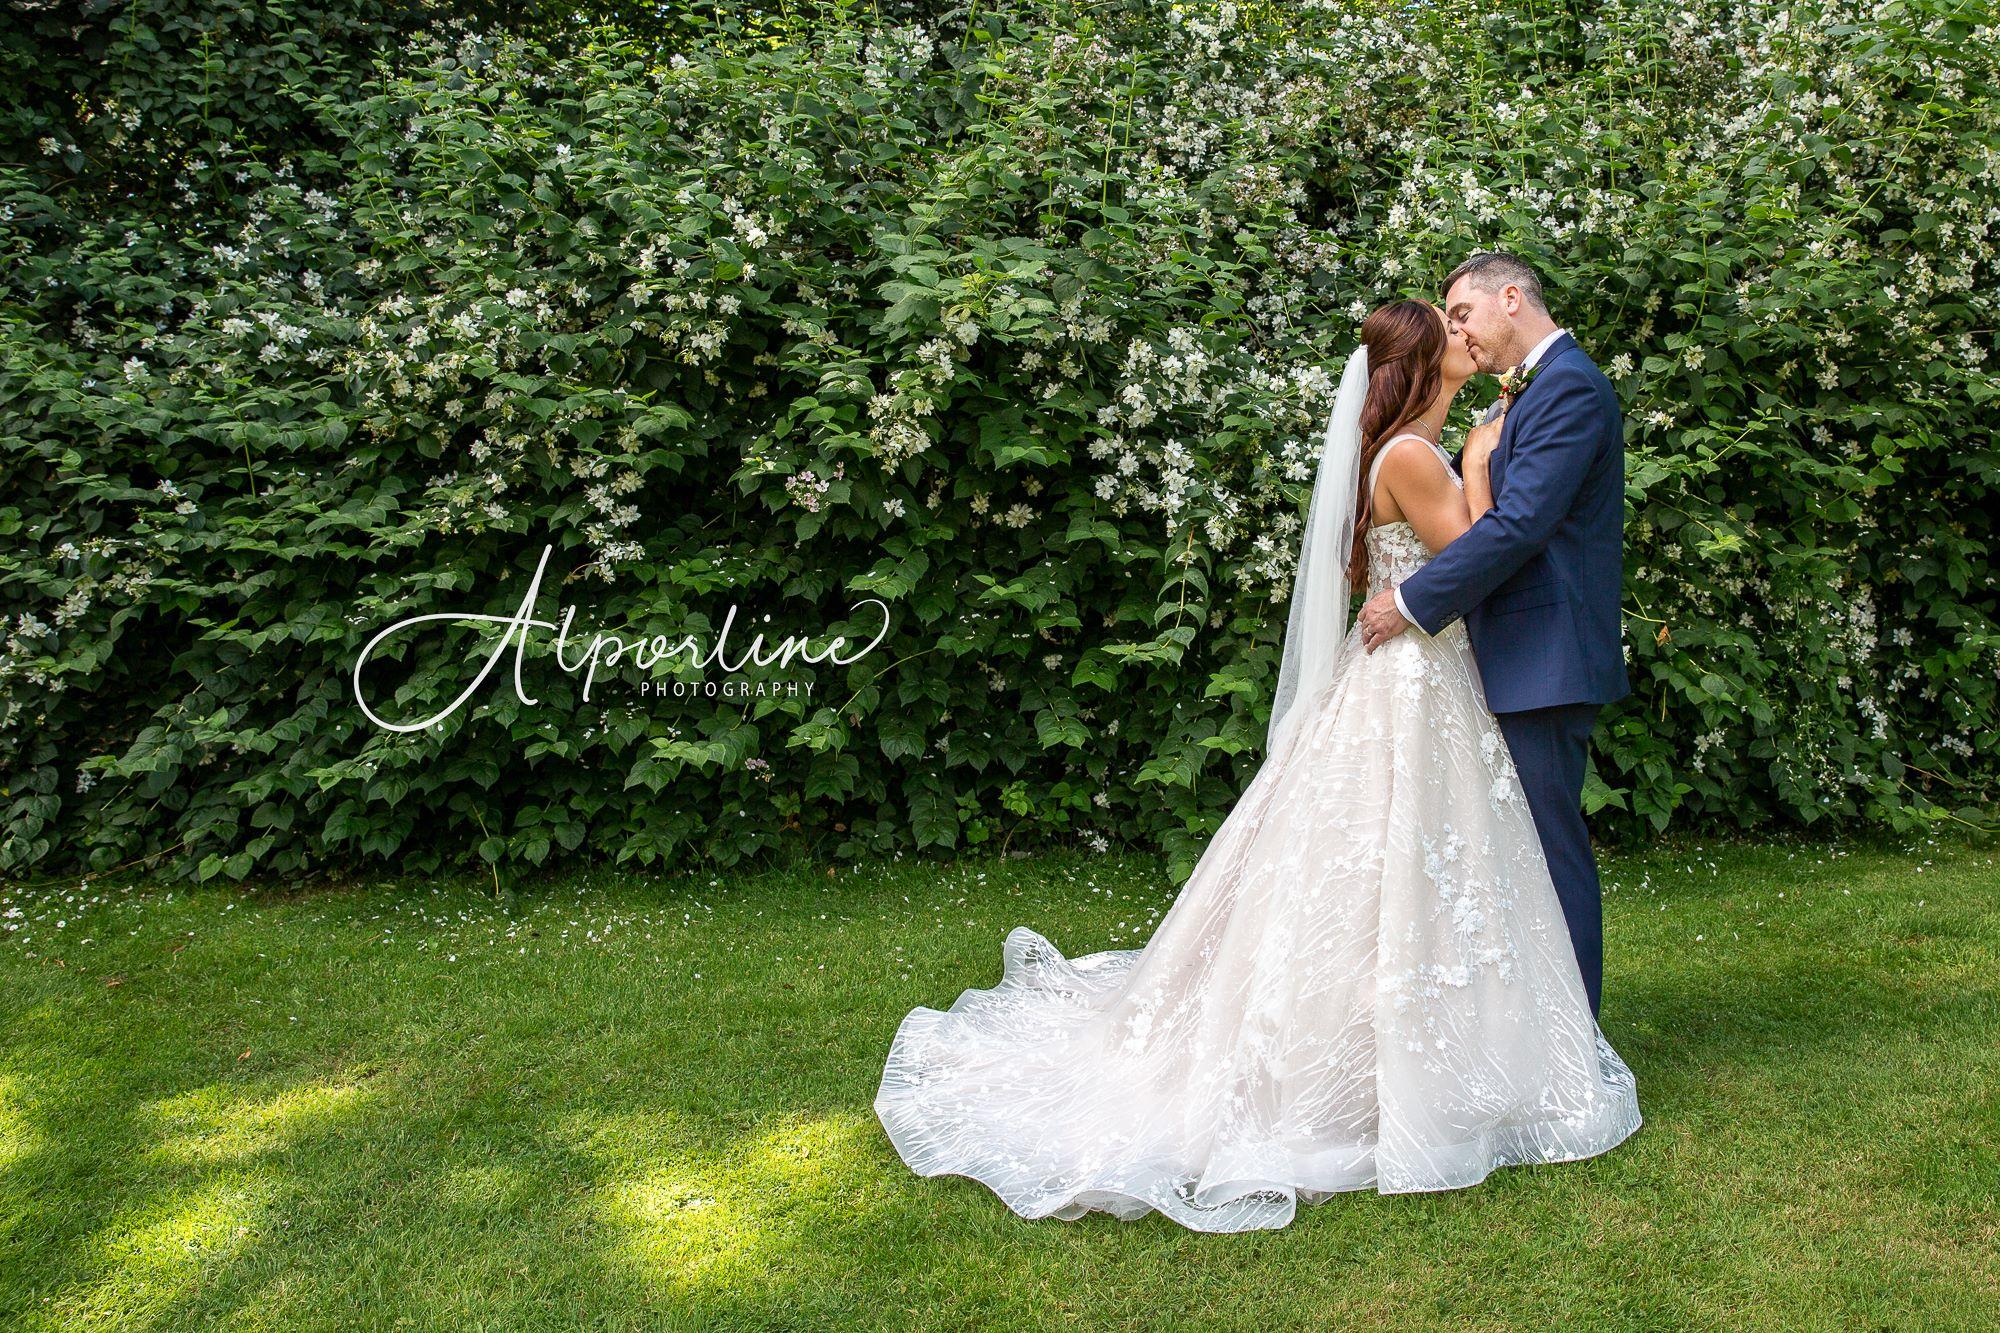 Farrington-lodge-wedding-photograph-preston-wedding-photographer.jpg